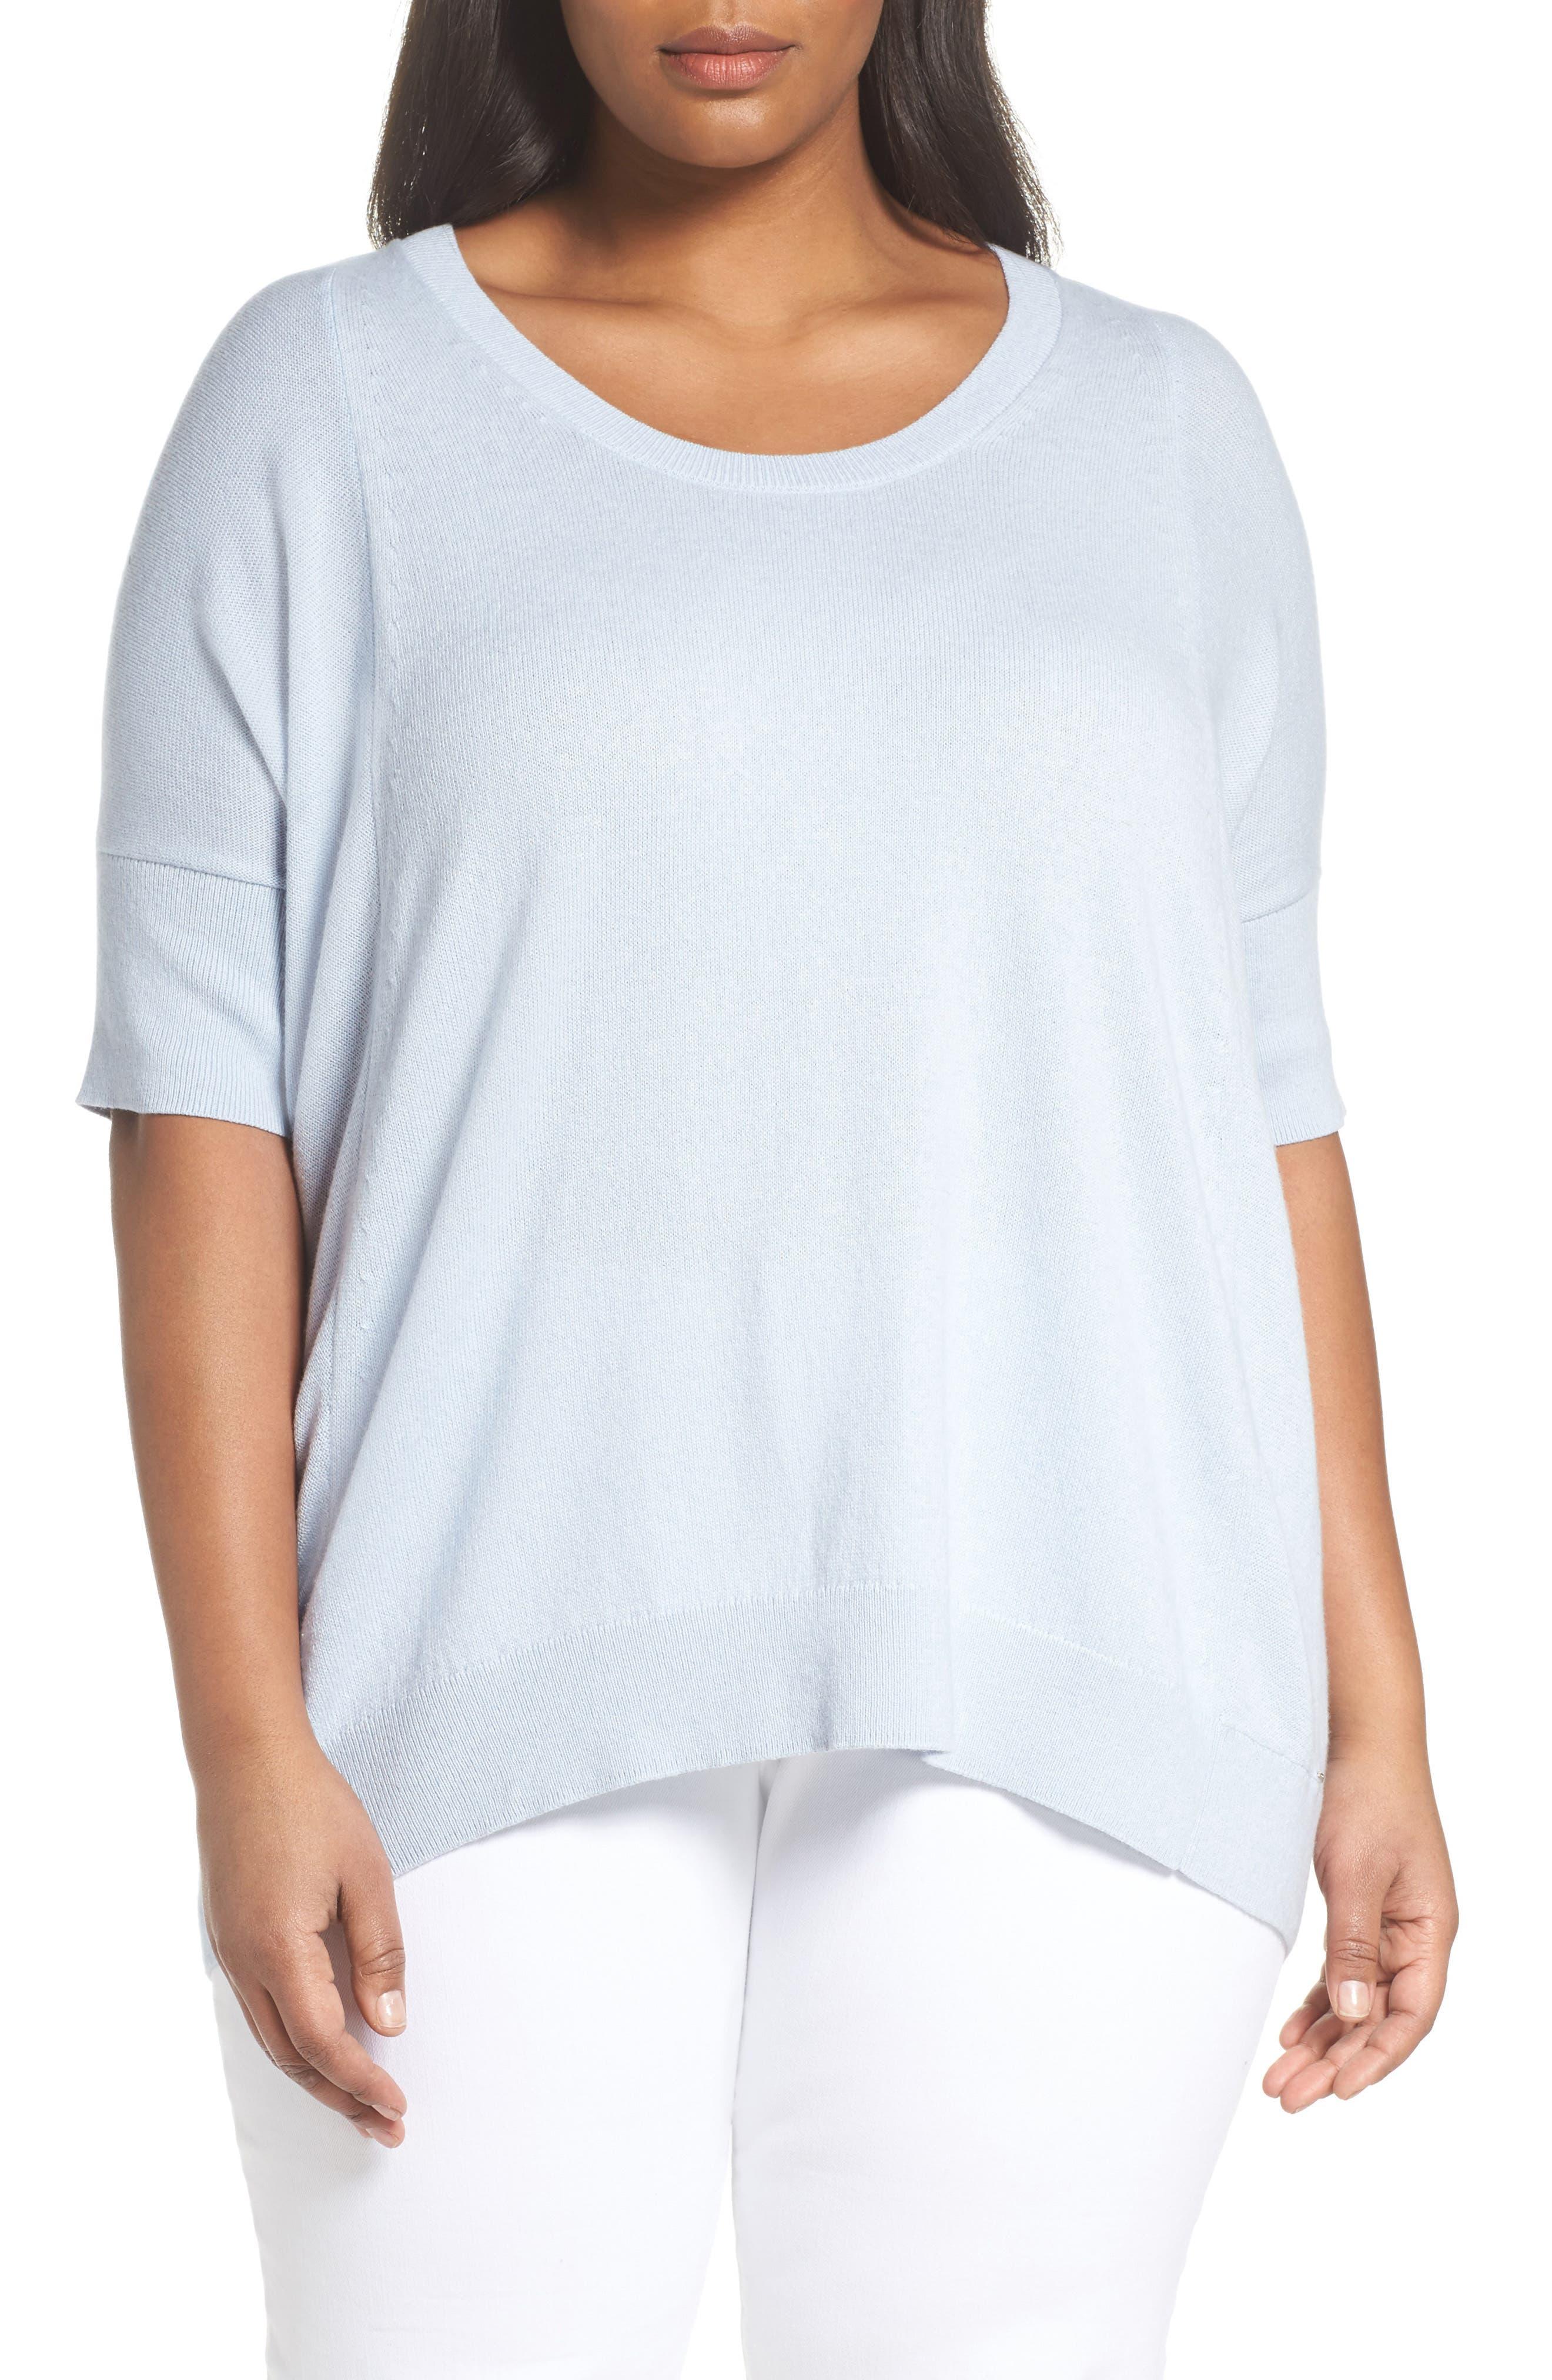 Cotton, Cashmere & Silk Oversized Scoop Neck Sweater,                         Main,                         color, Pale Blue Melange